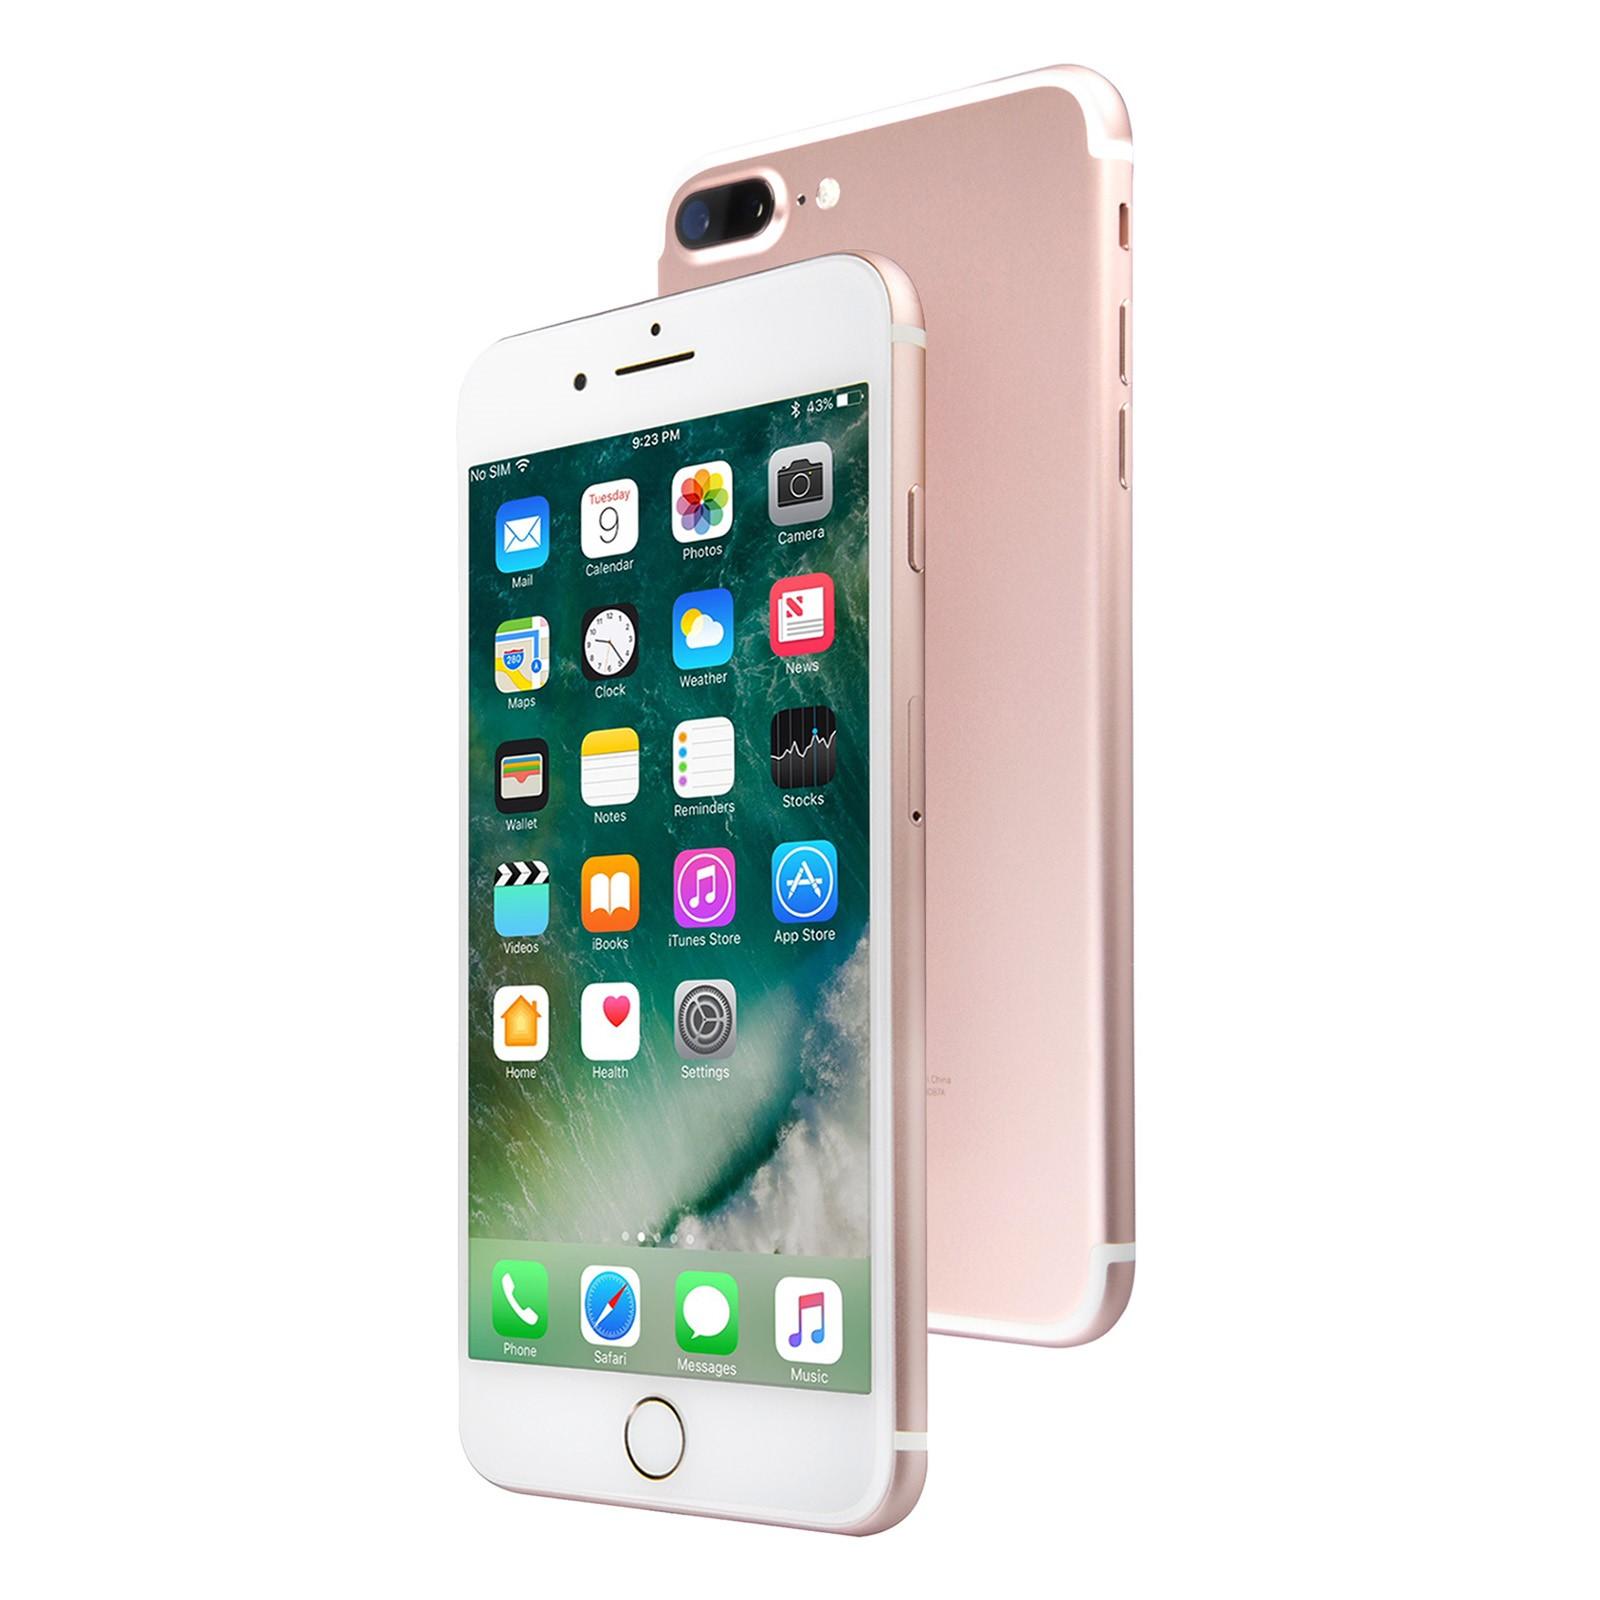 Apple Iphone 7 Plus 32 GB Unlocked, Rose Gold (Certified )